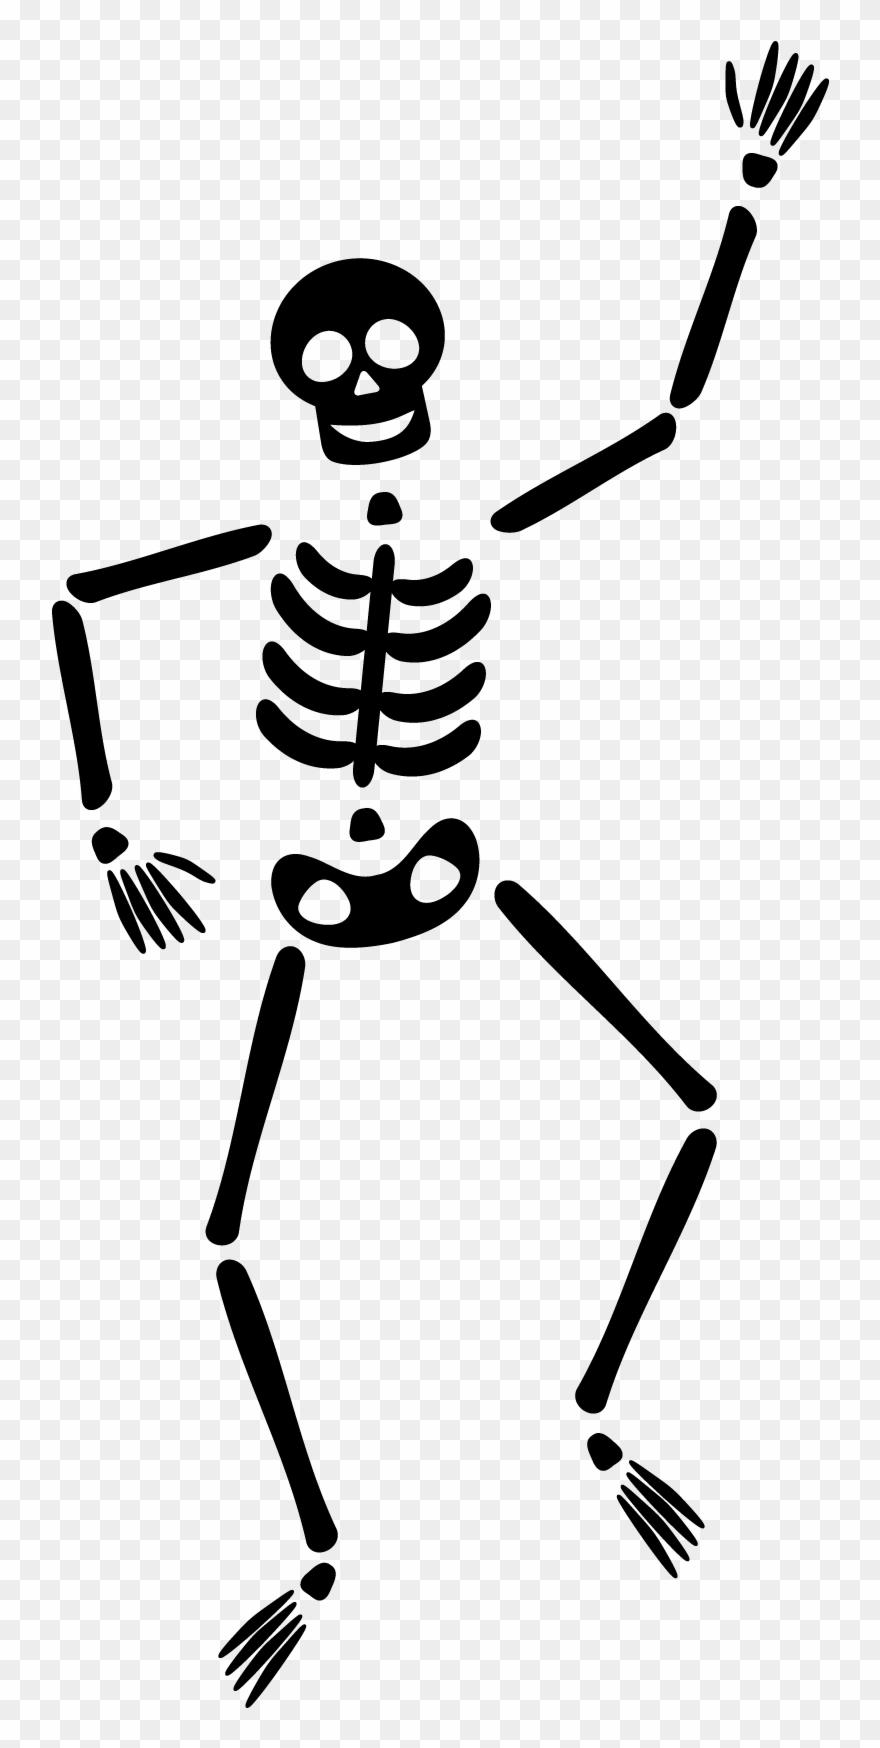 Dancing Skeleton Clipart.